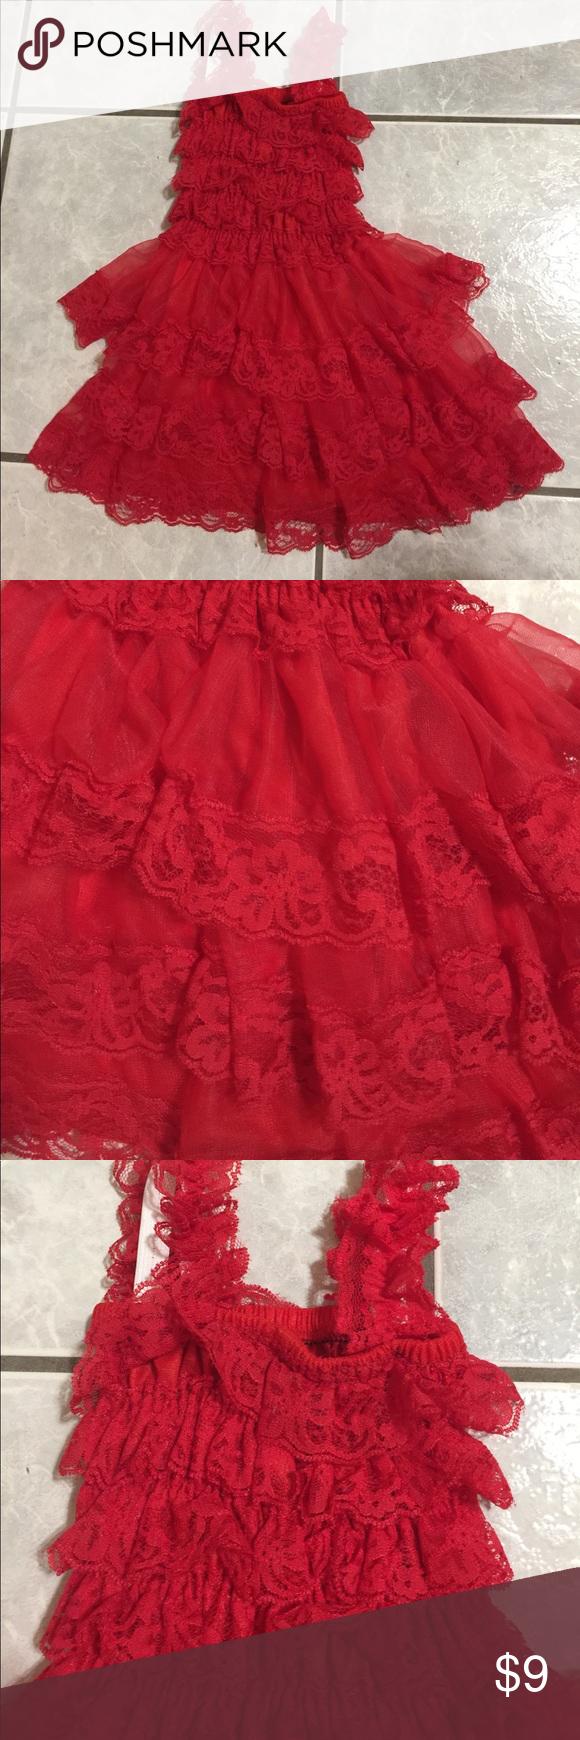 Valentines little girls dress toddler sizes m u l ruffles lace dress